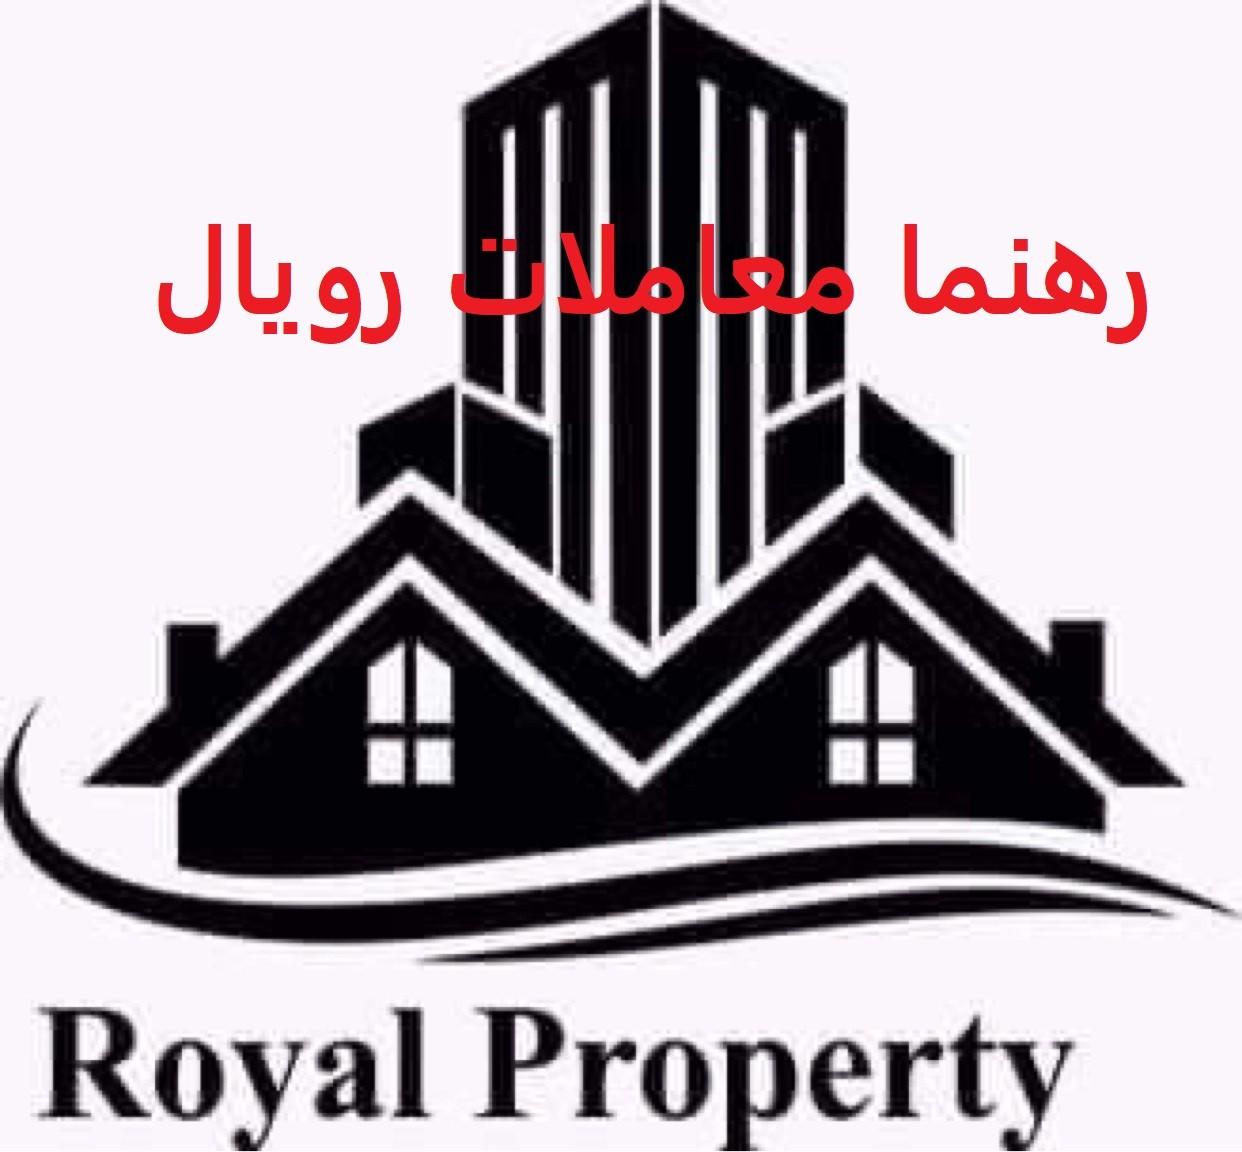 Royal Property Kabul